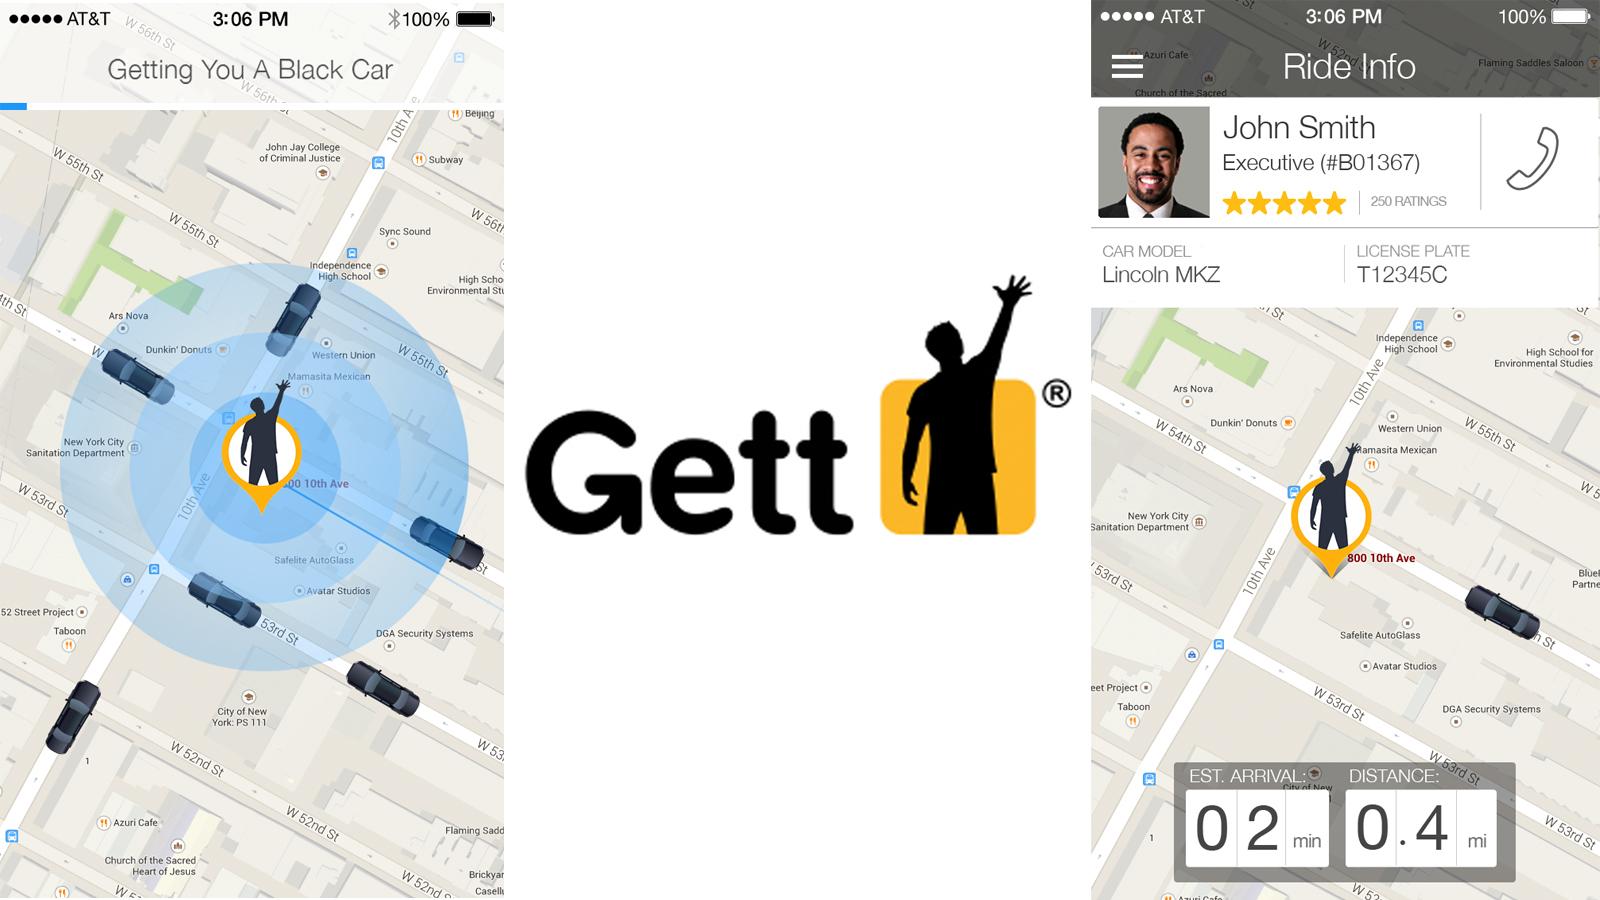 Gett ride-hailing app. Photos by Gett